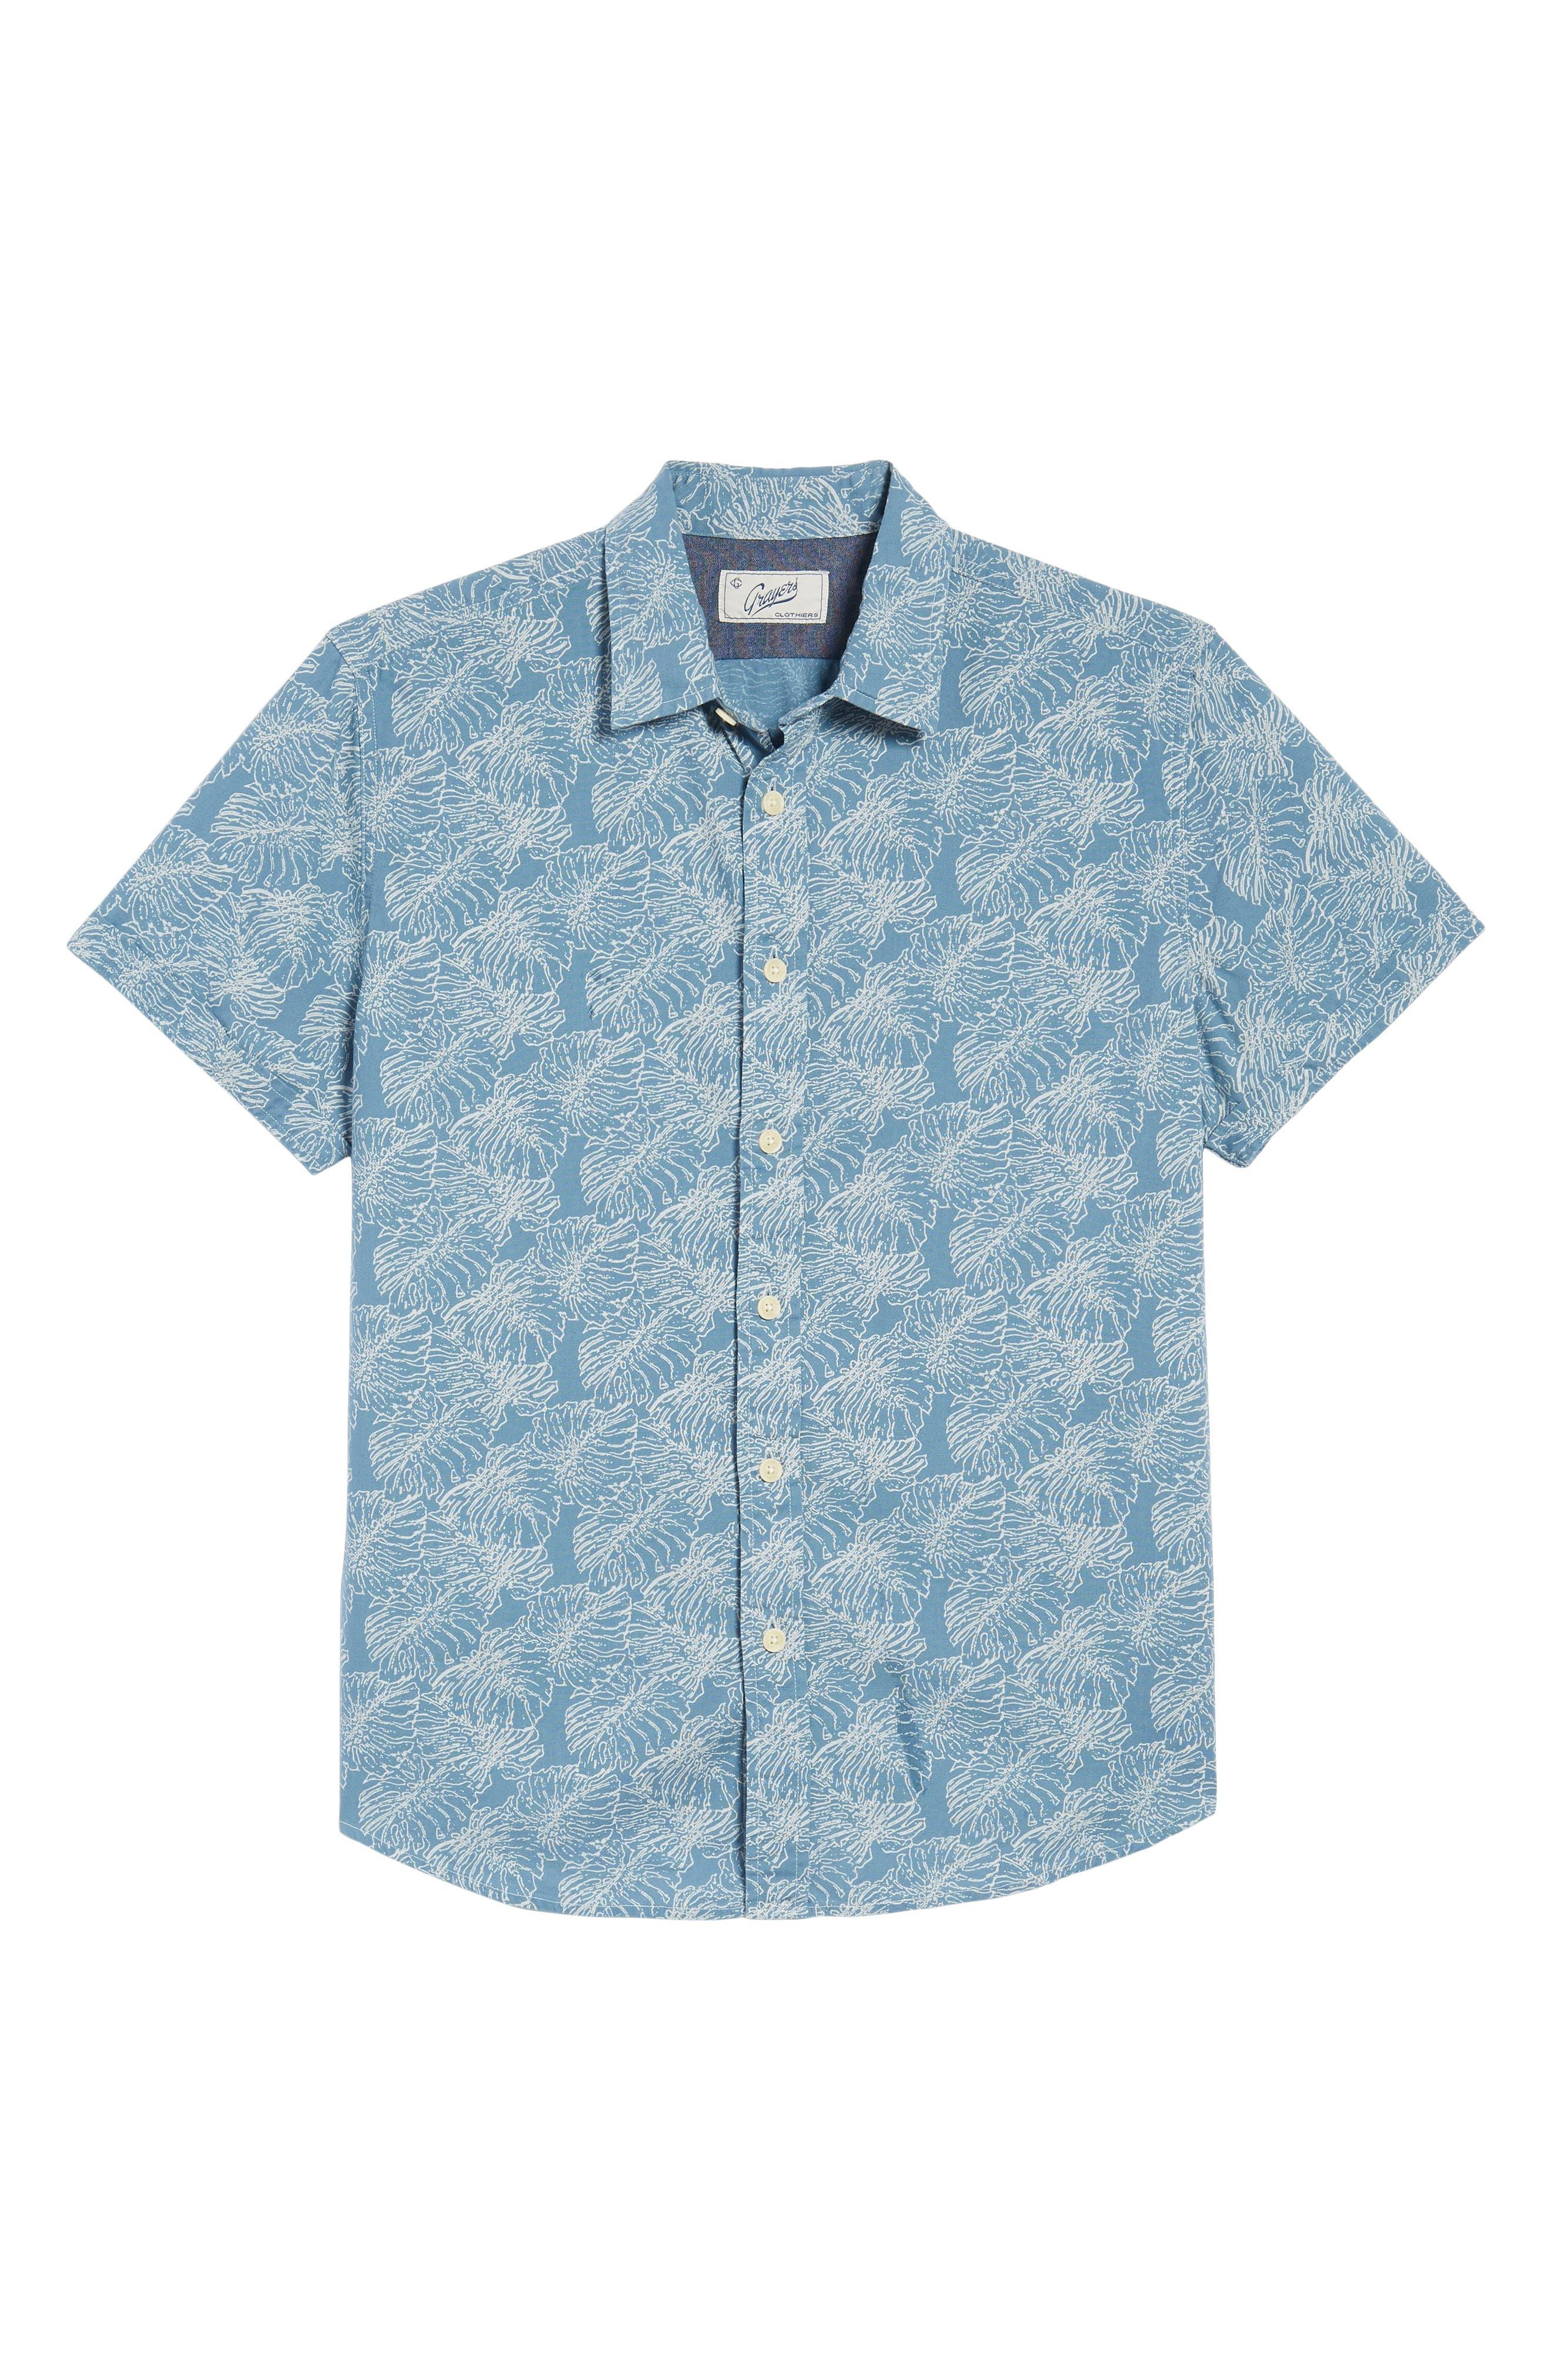 Leaf Print Short Sleeve Sport Shirt,                             Alternate thumbnail 6, color,                             Moonnight Blue